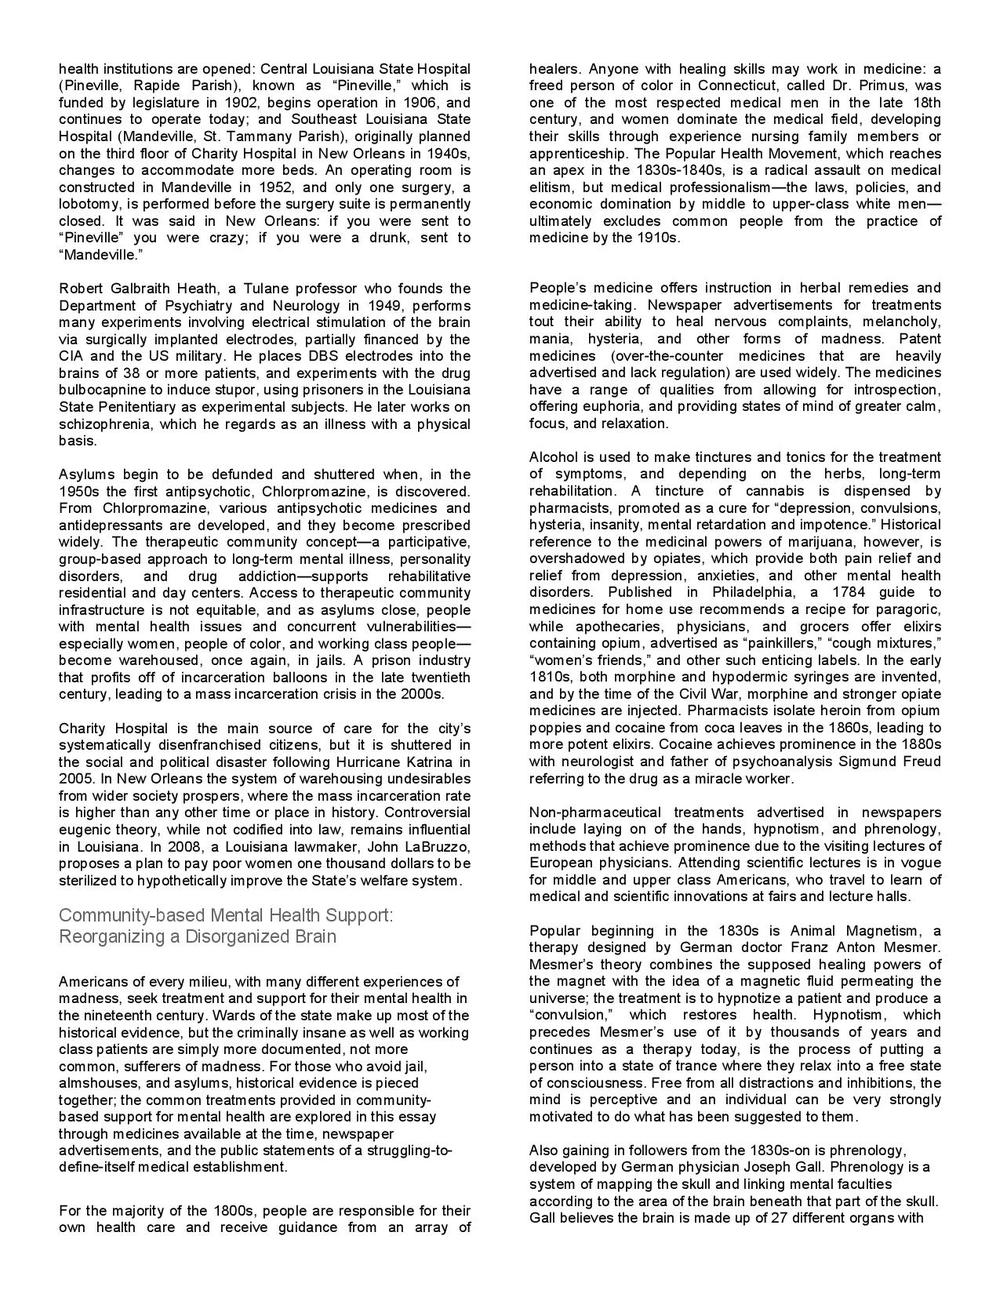 Timeline-page-005.jpg